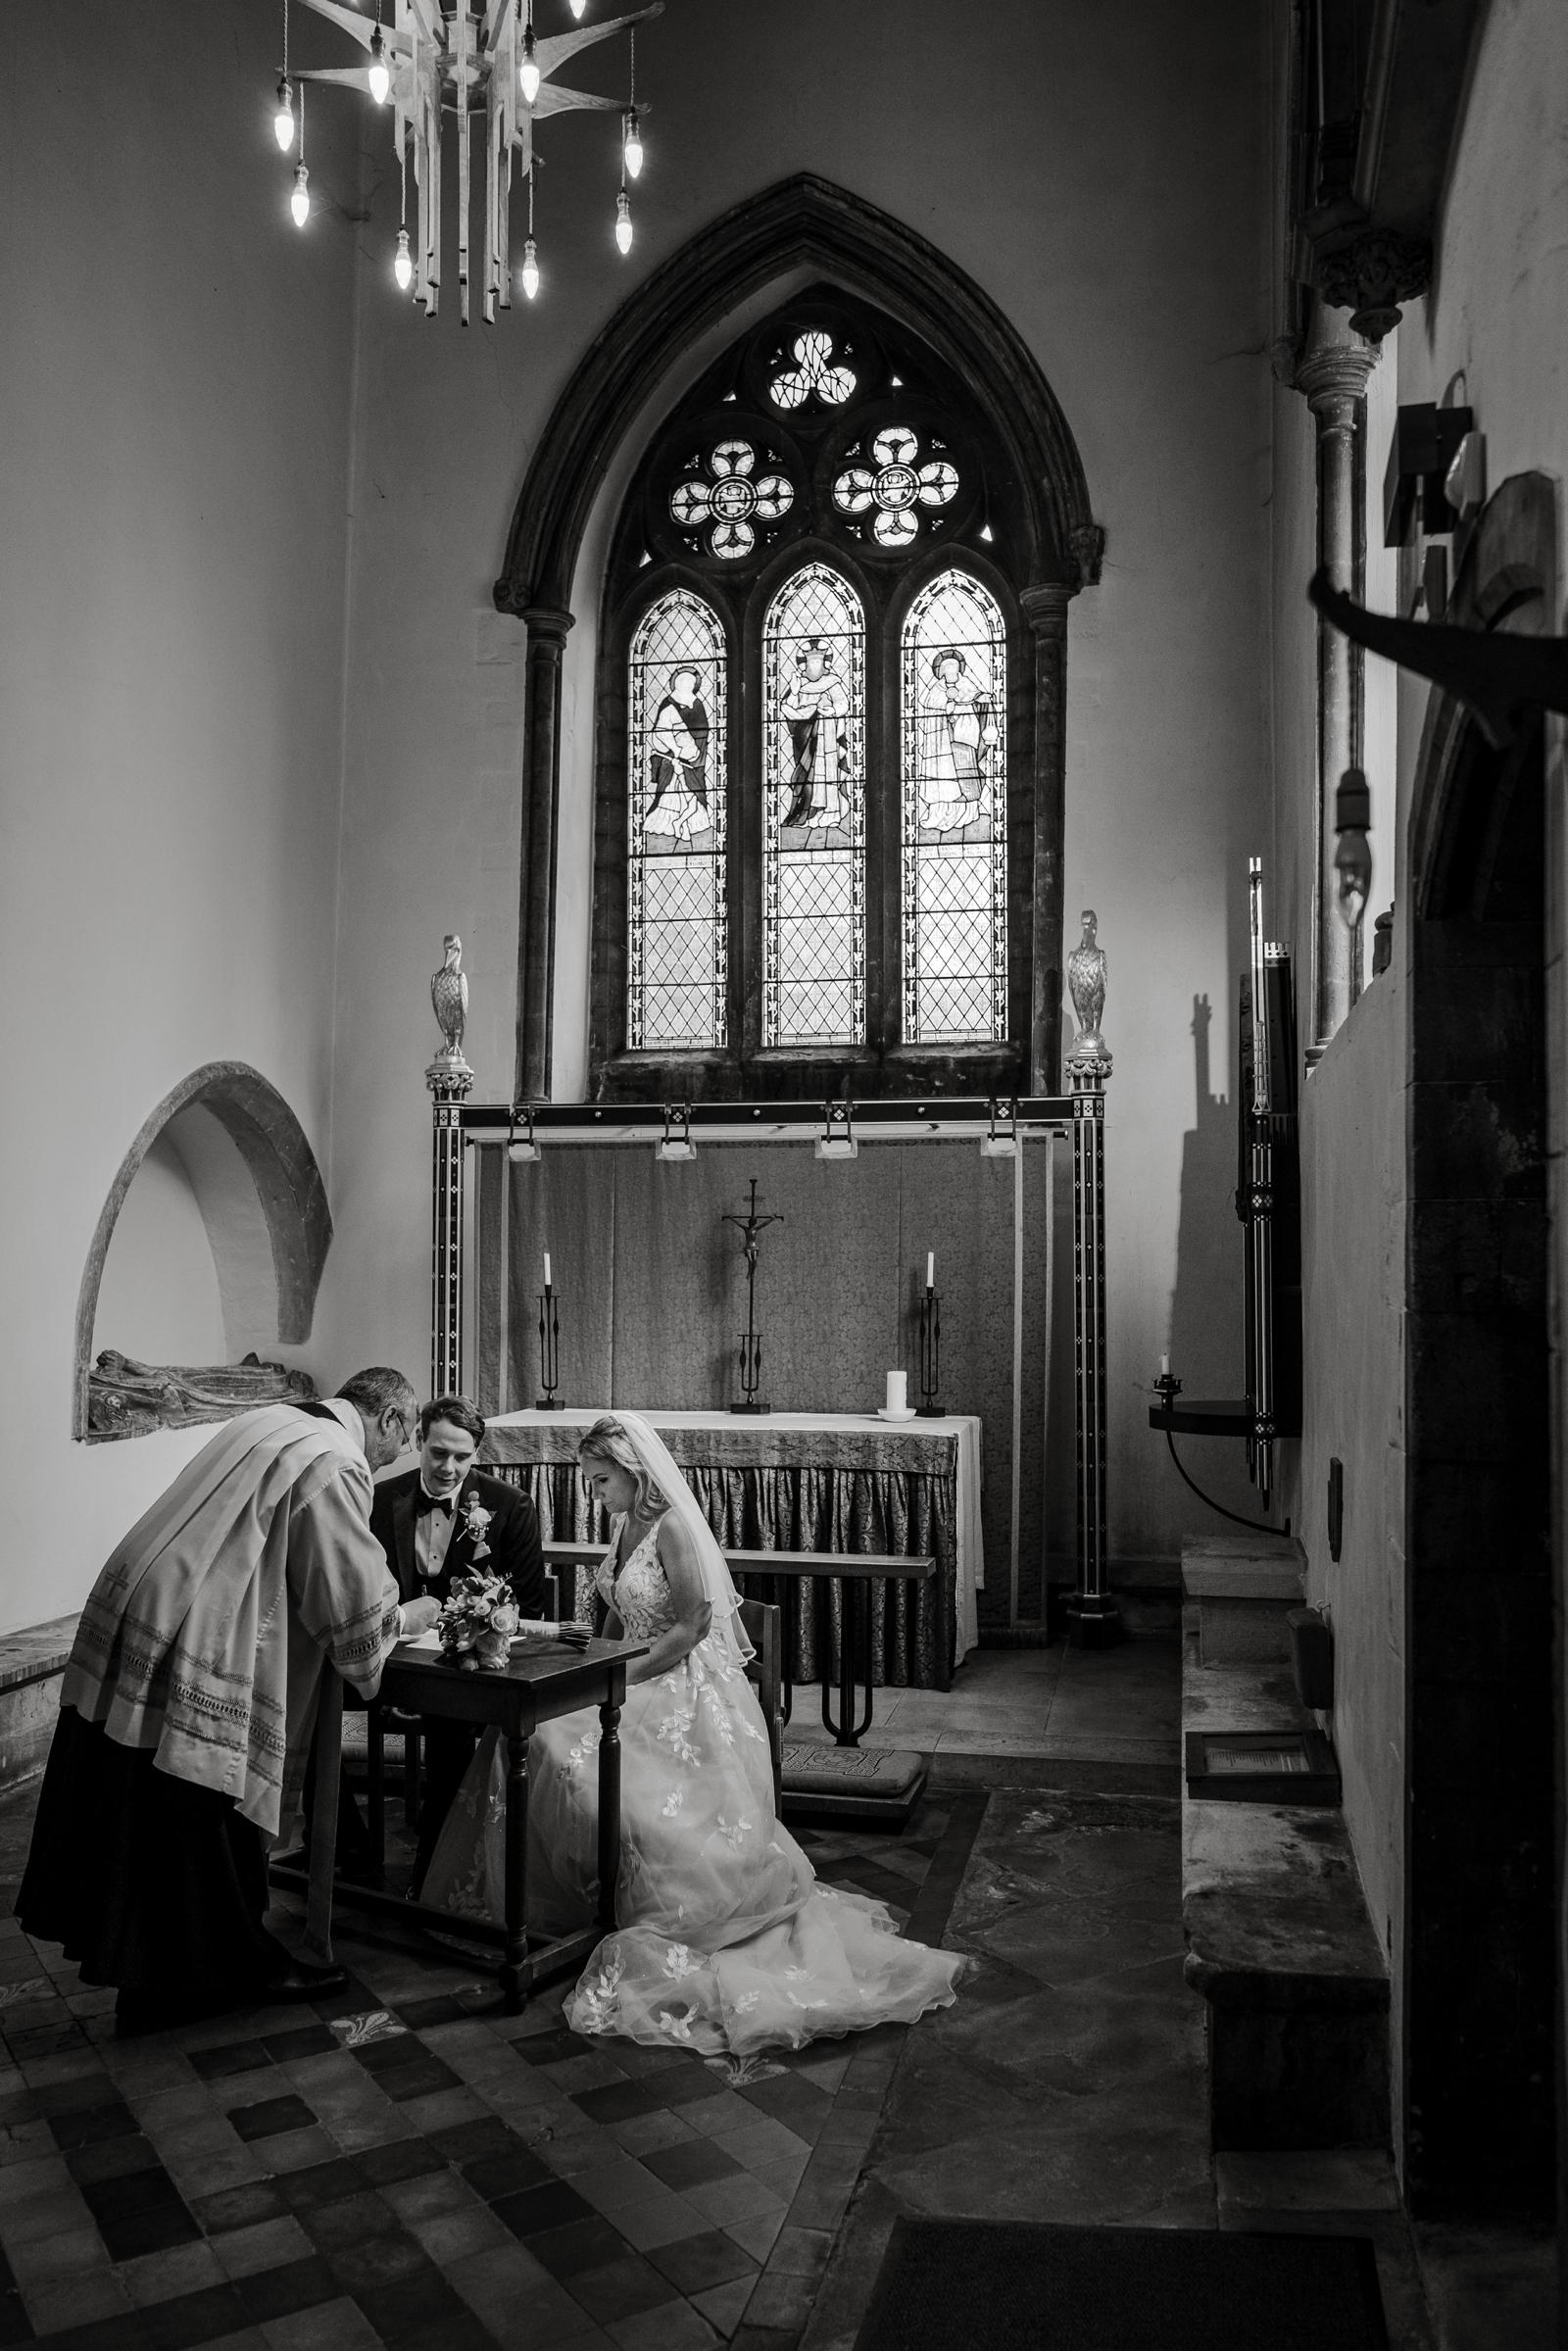 Signing register at Llandaff Cathedral